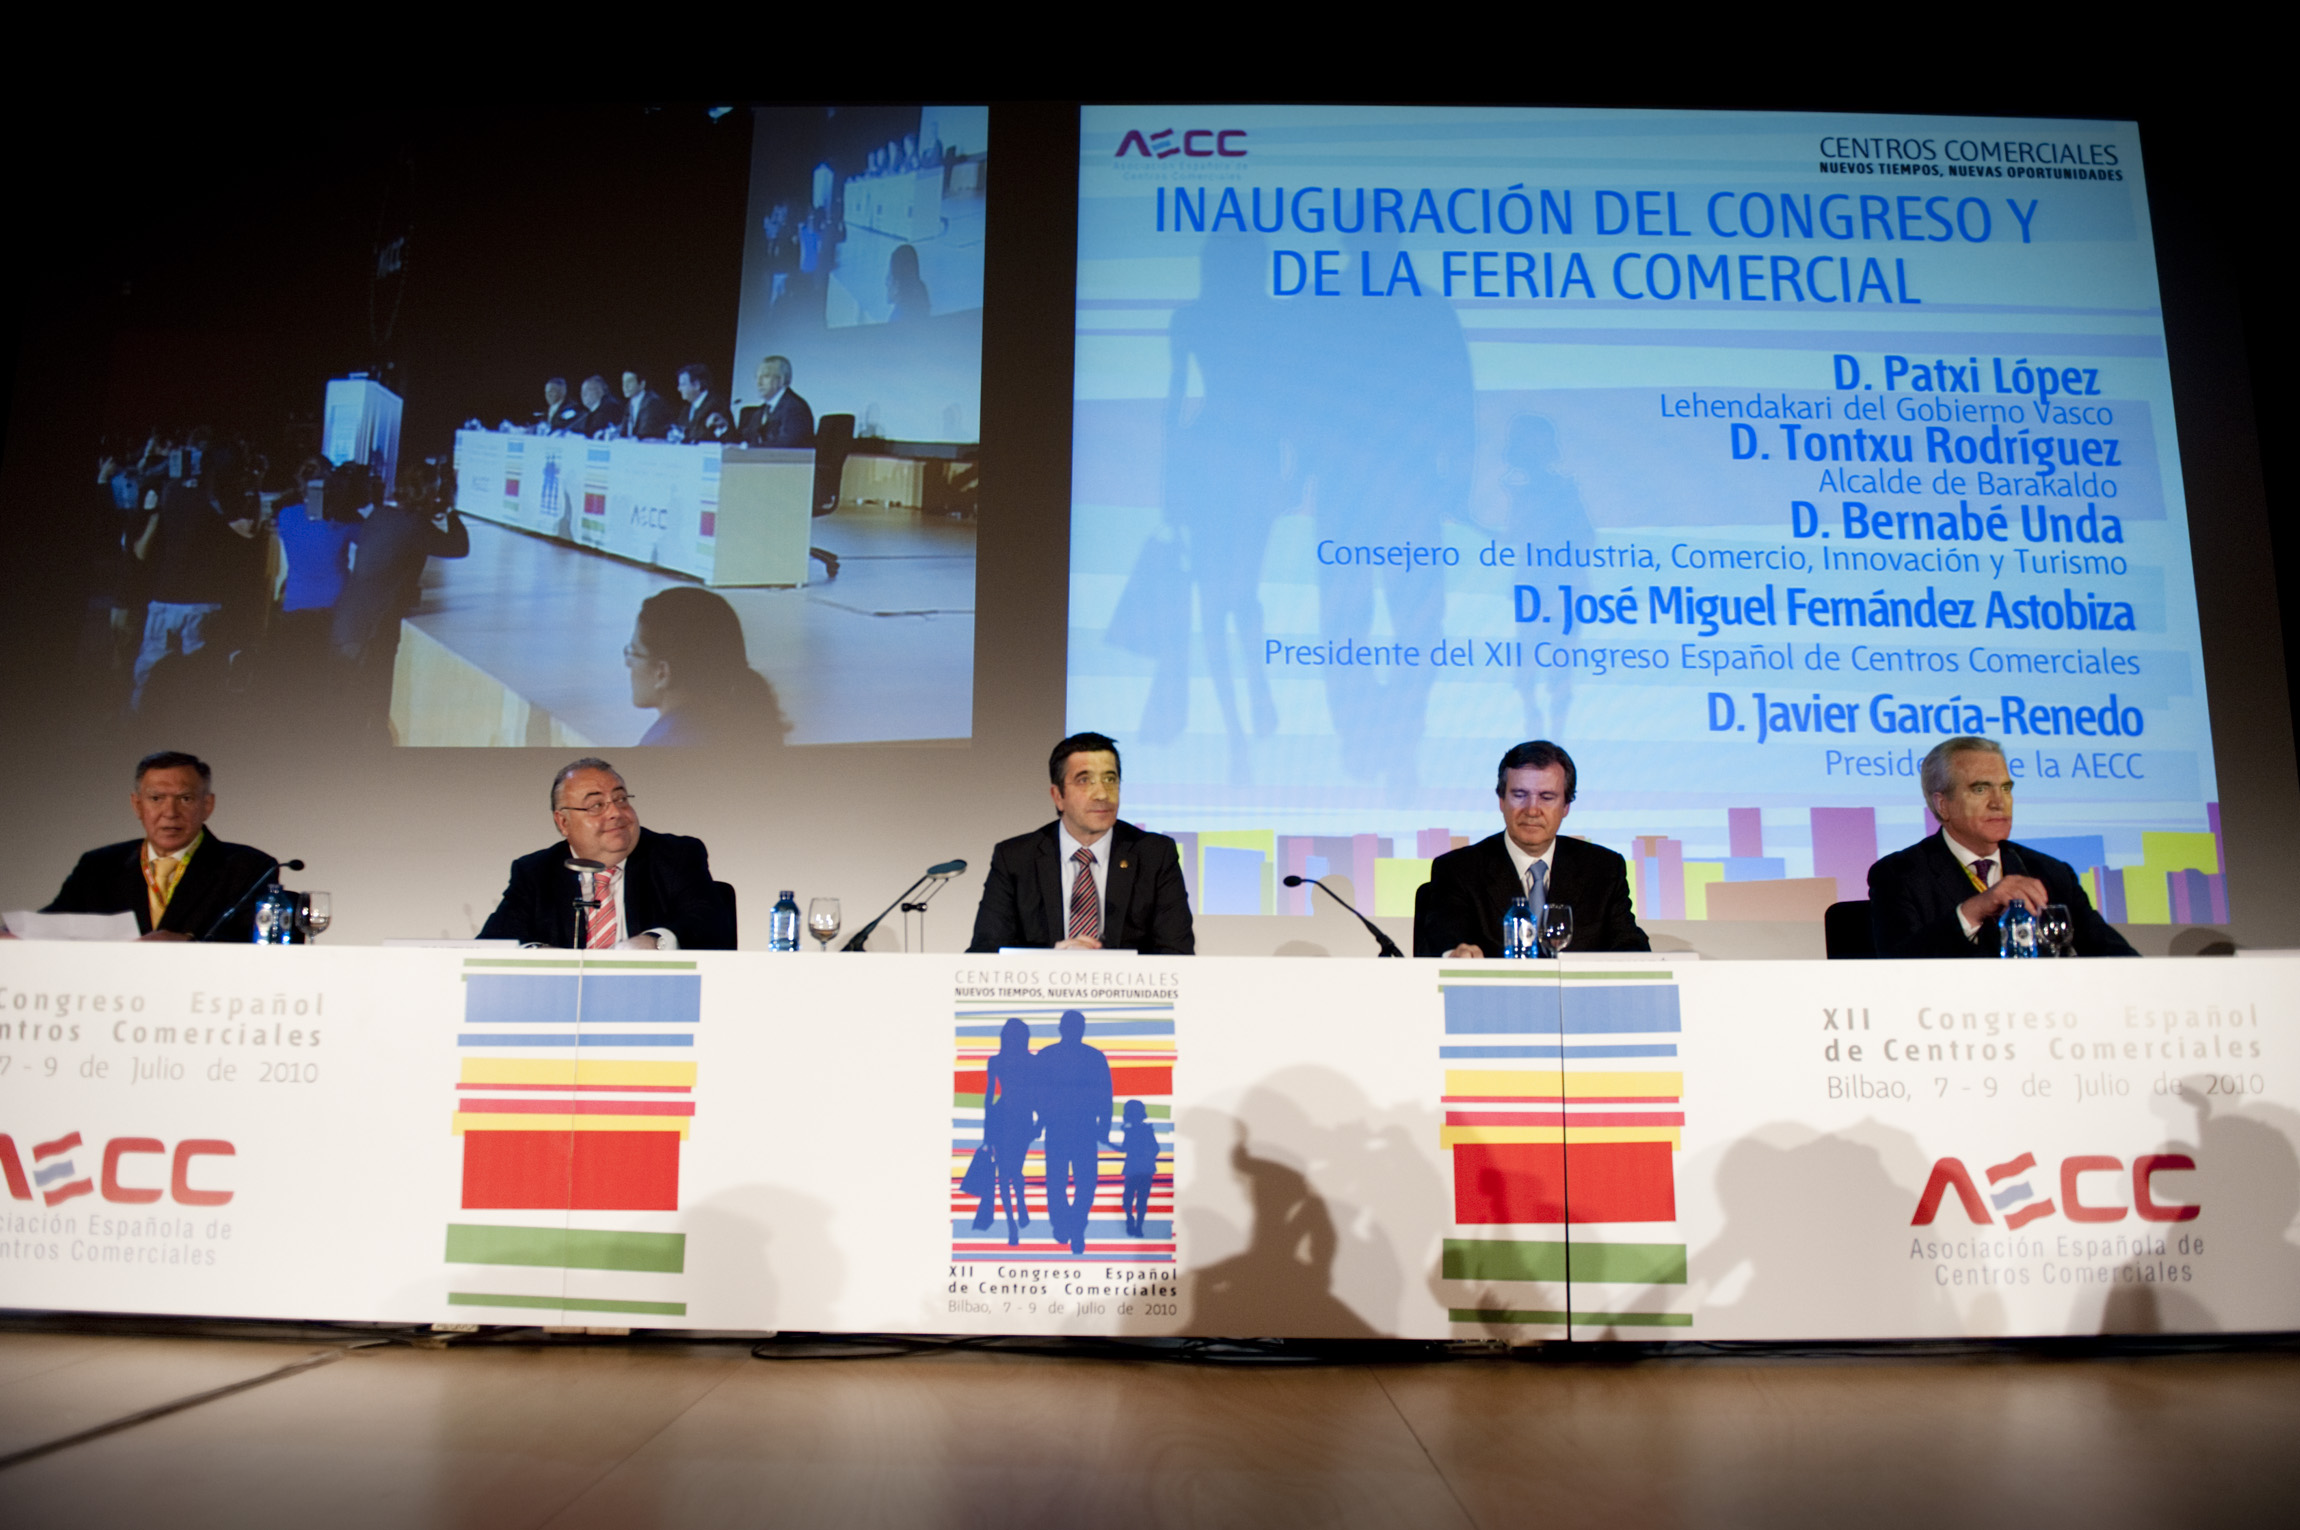 inauguracioncongreso.jpg